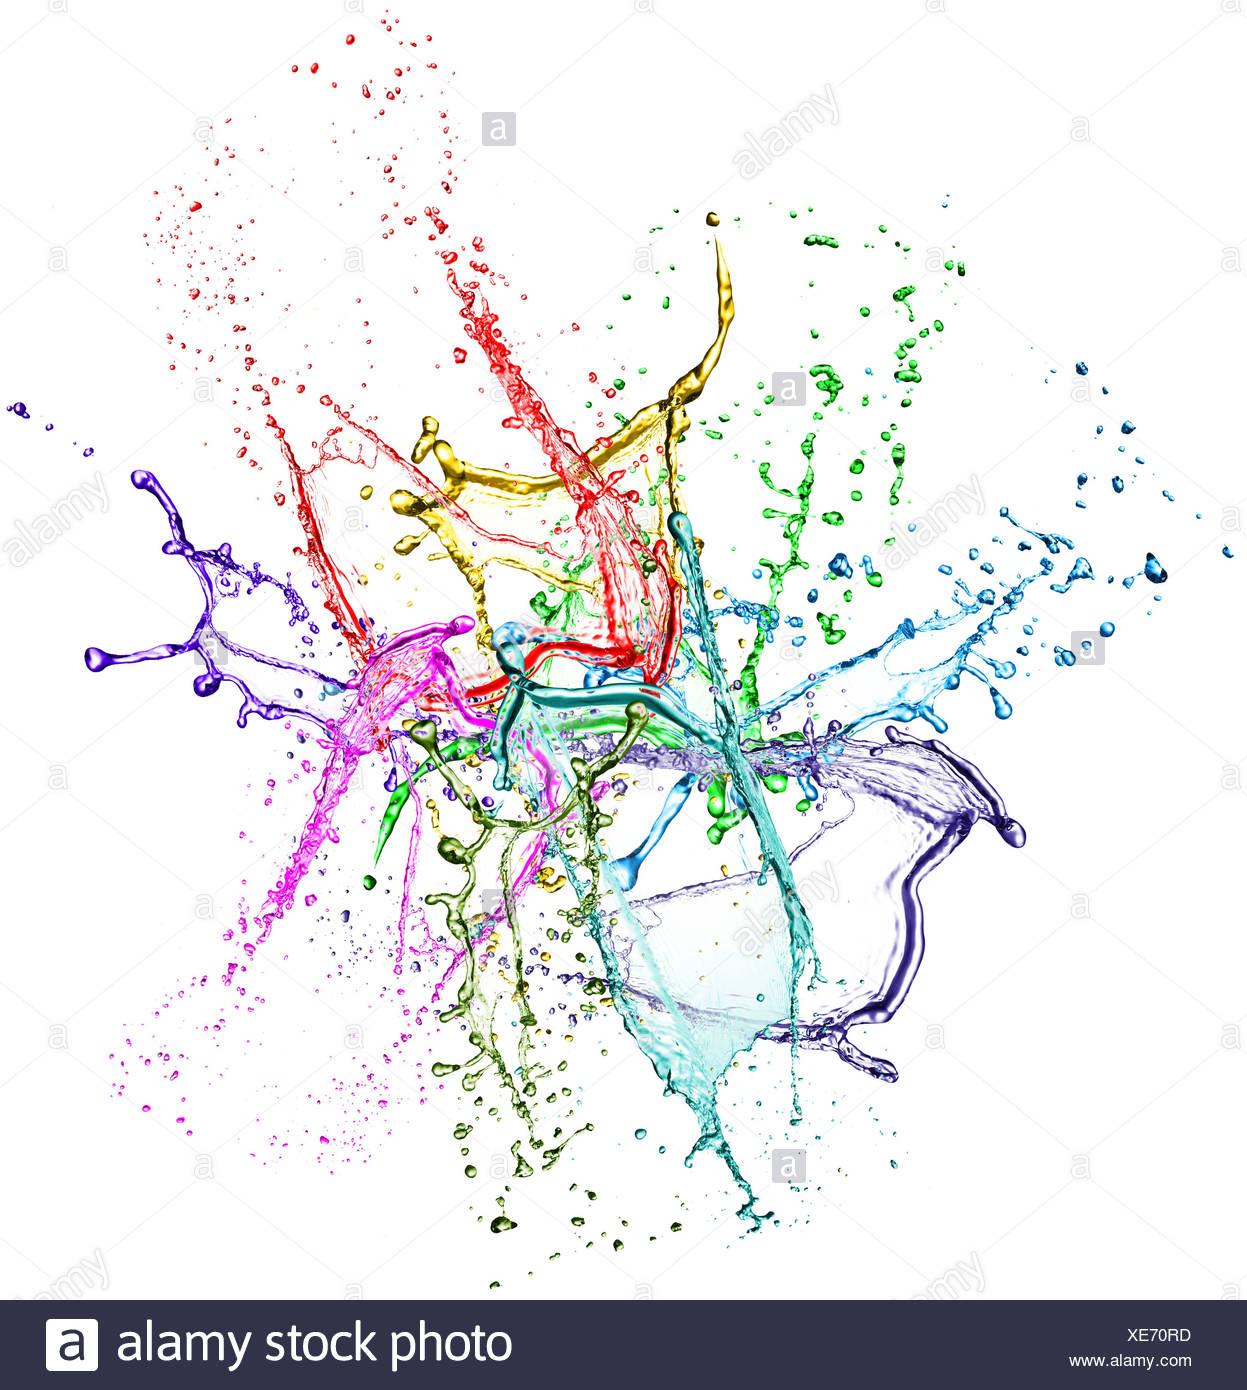 farbe spritzen stockfoto, bild: 284125393 - alamy